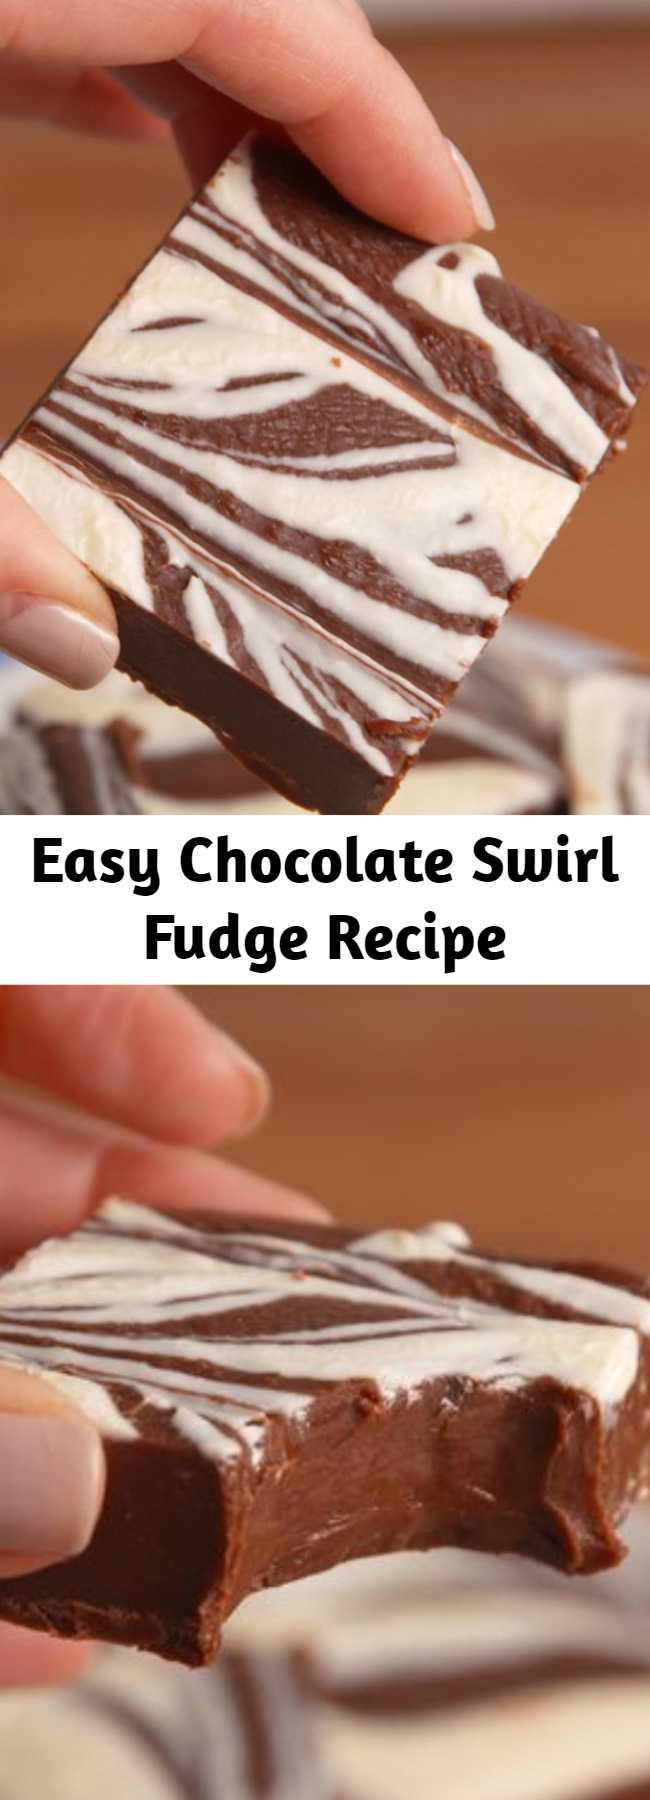 Easy Chocolate Swirl Fudge Recipe - Master this classic but surprisingly easy recipe for chocolate swirl fudge.